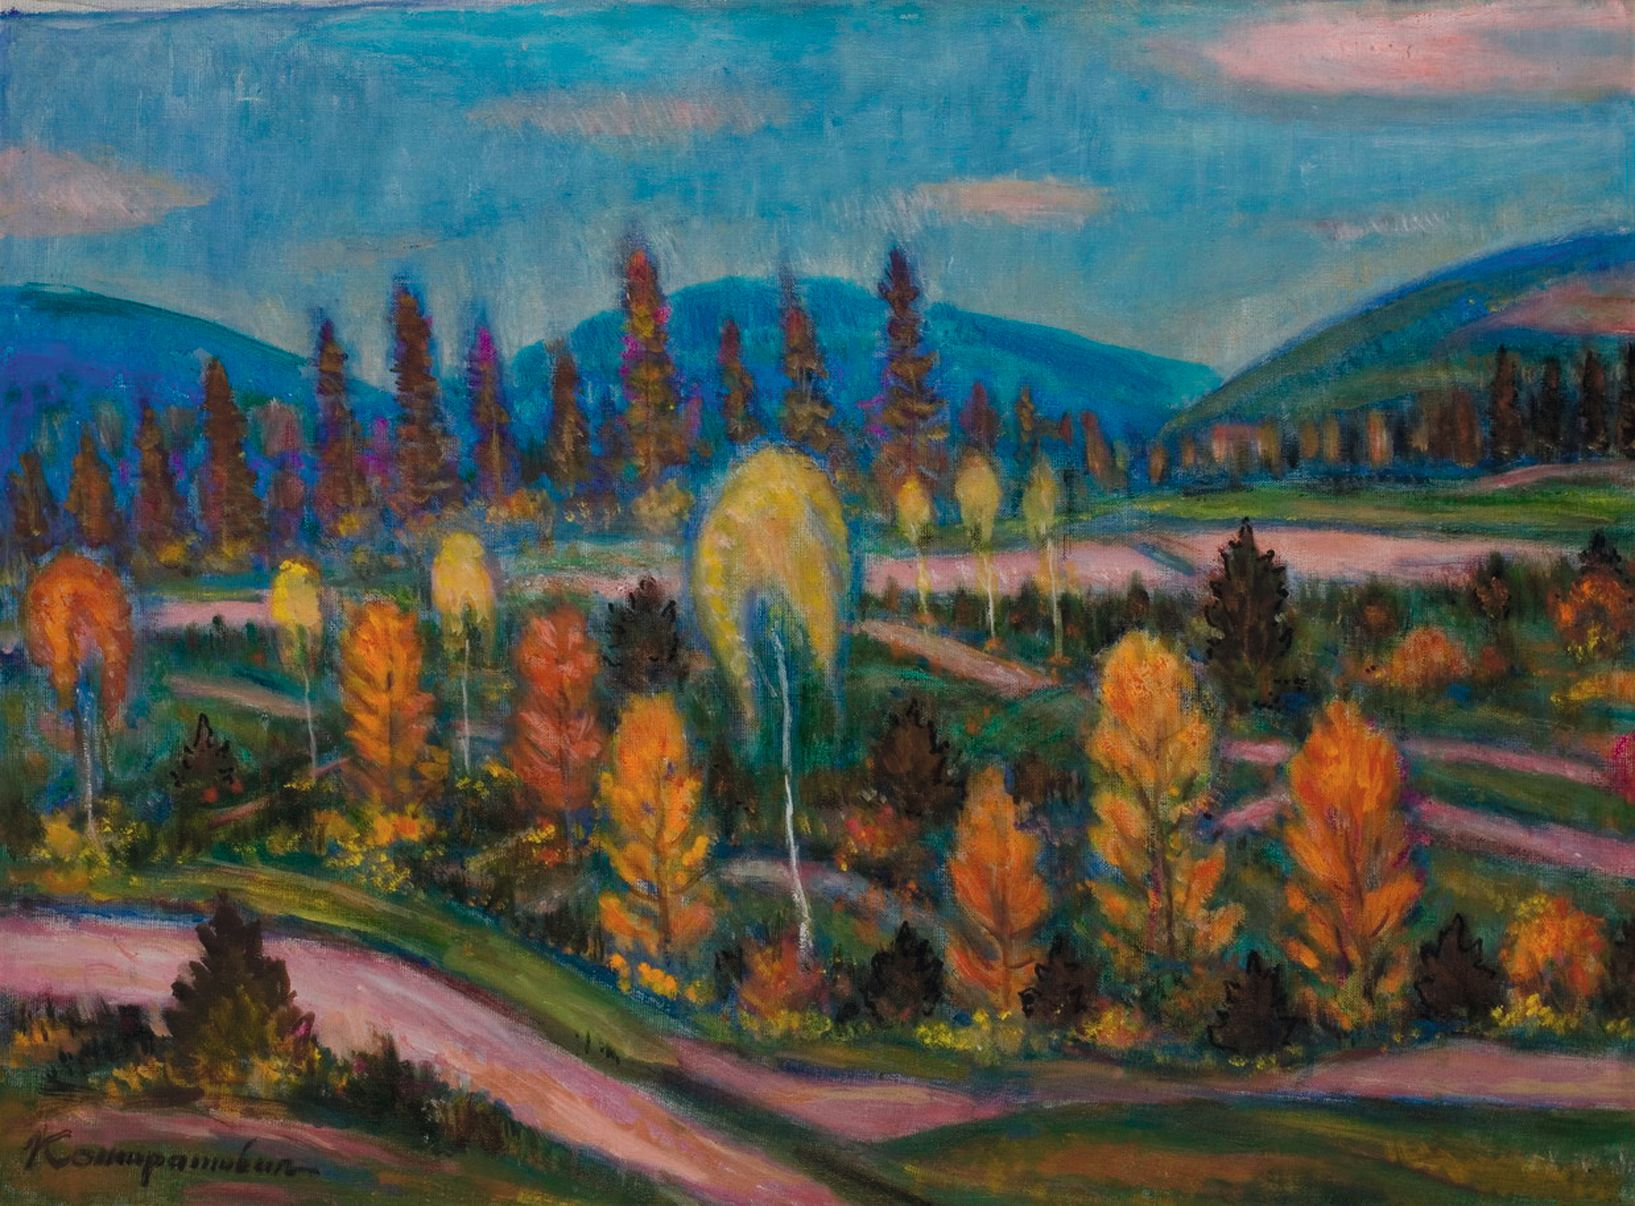 Э. Контратович. Горный пейзаж. Х., м. 64×84см. «Эпоха», май 2008 — $2500